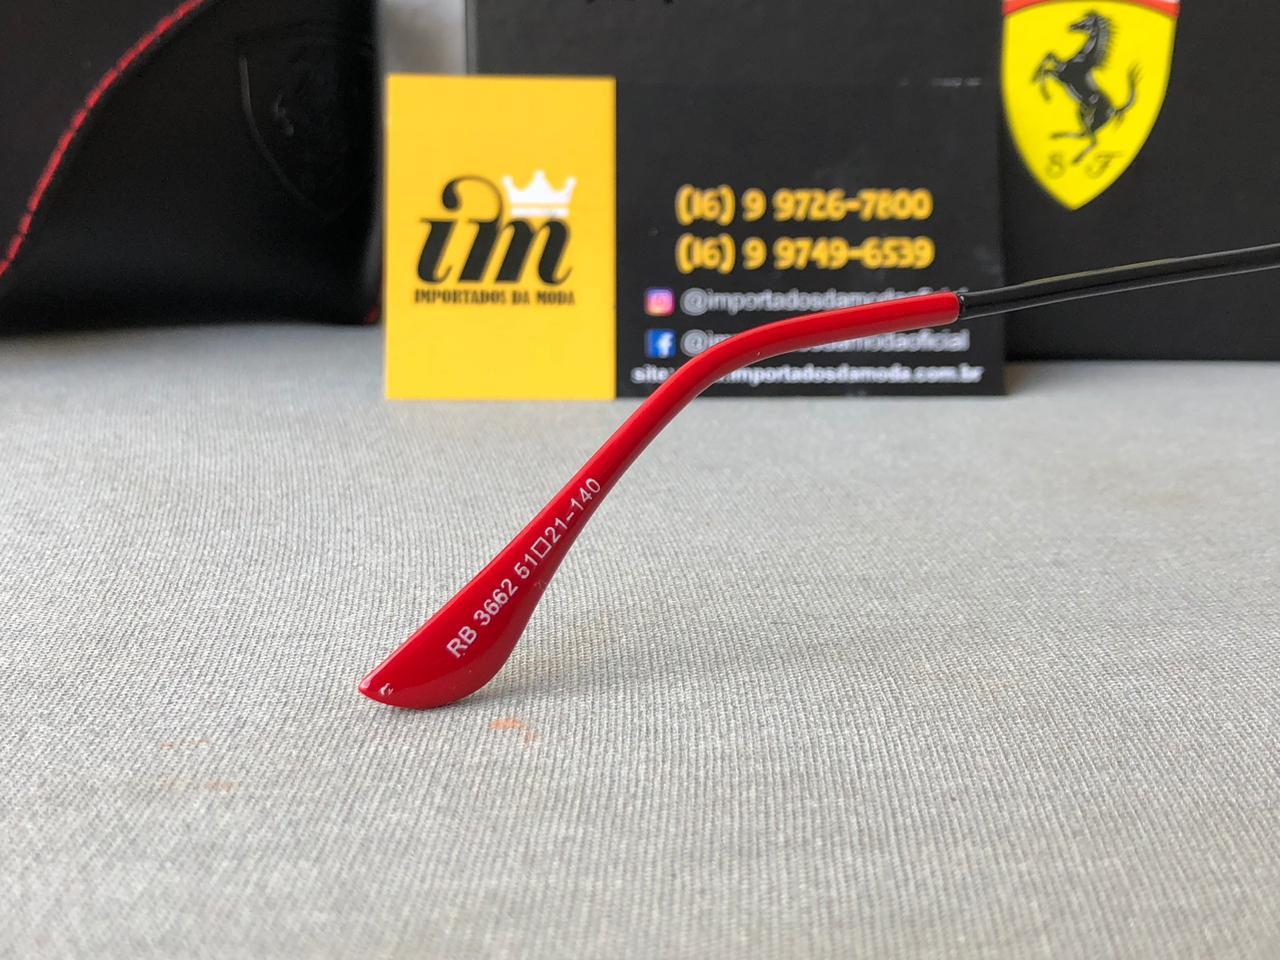 Óculos de Sol Ray Ban Ferrari Réplica Primeira Linha 2